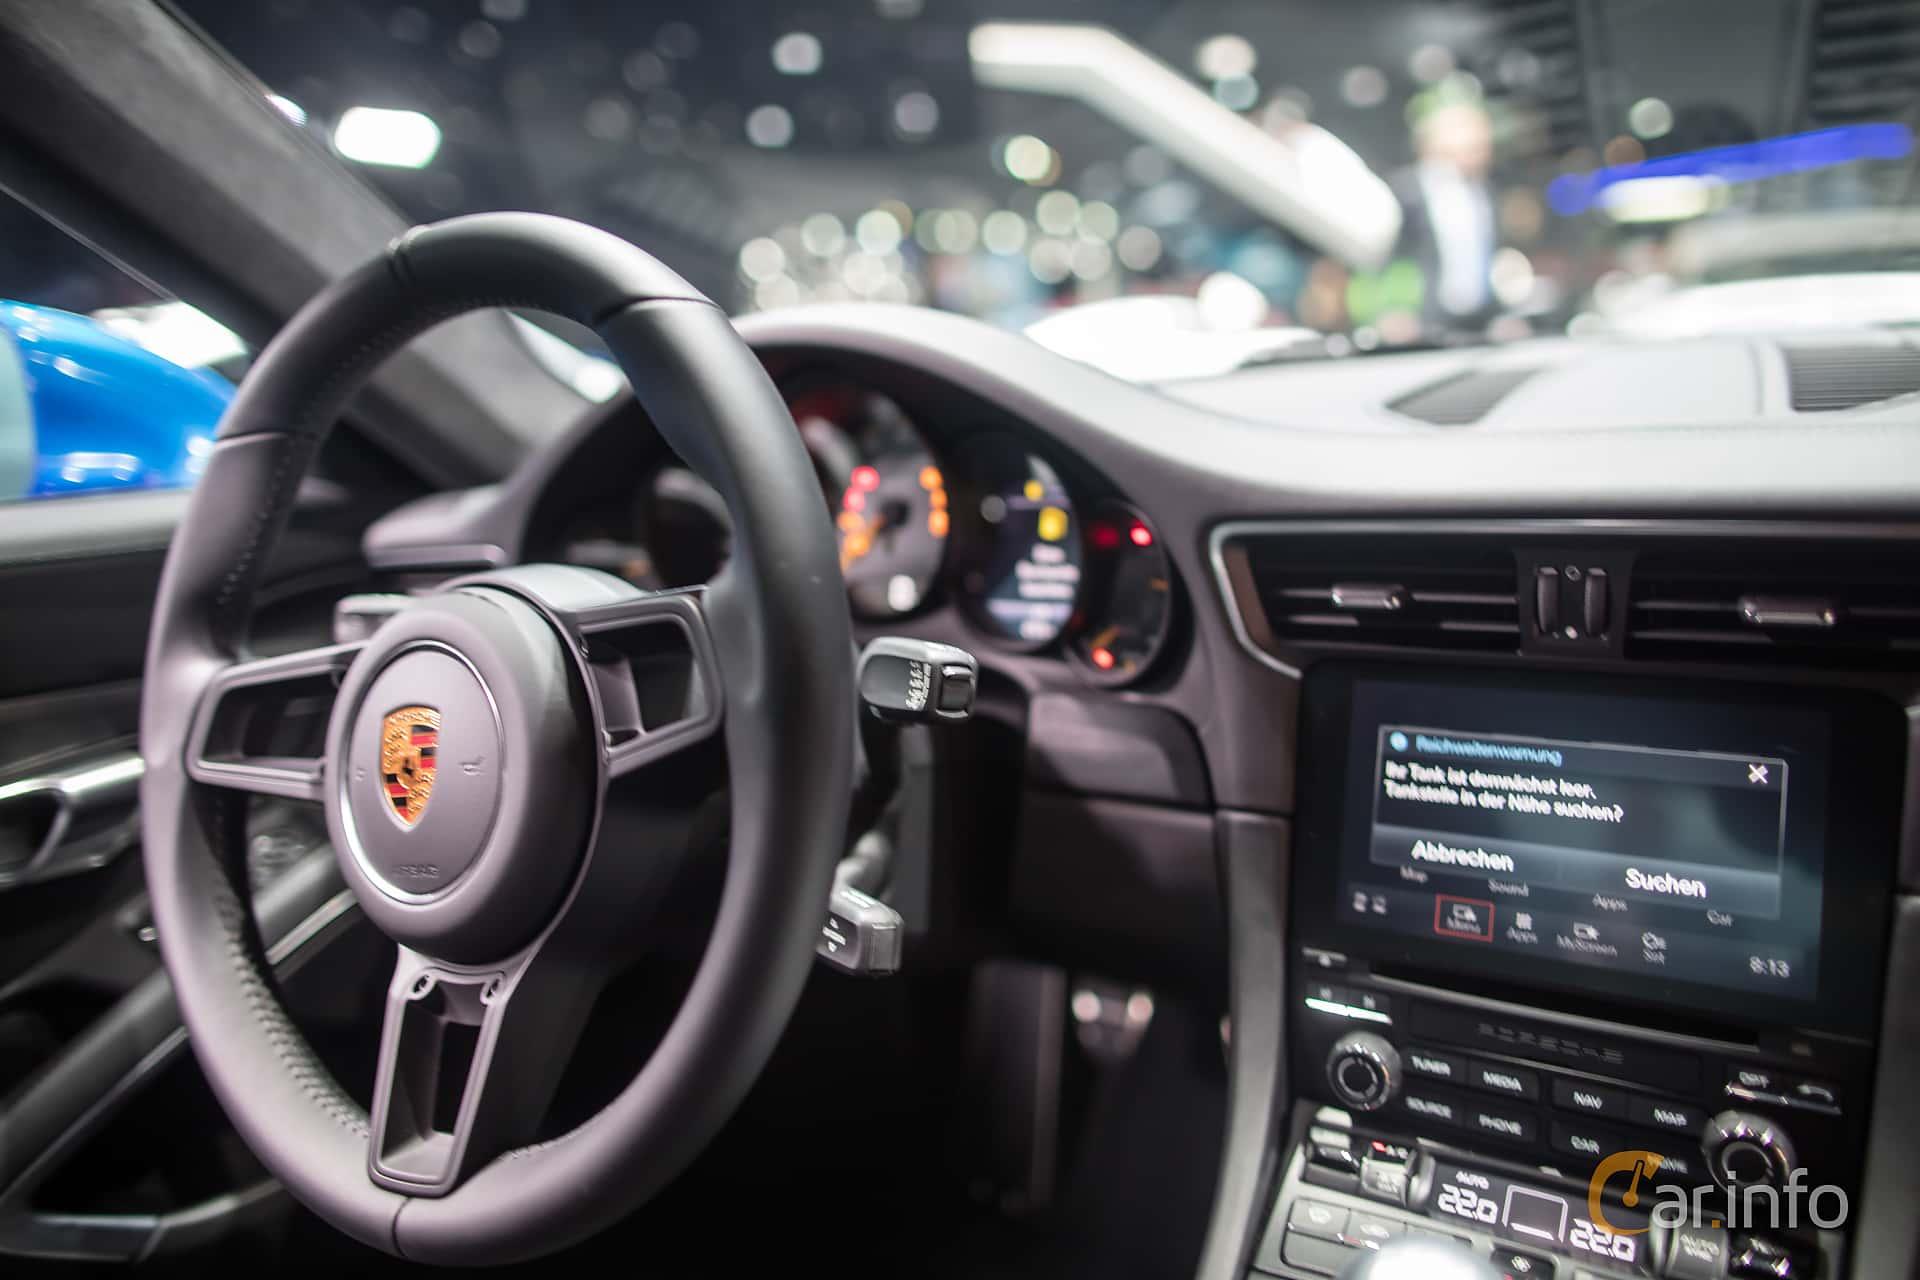 Porsche 911 GT3 4.0 H6 Manual, 500hp, 2018 at IAA 2017